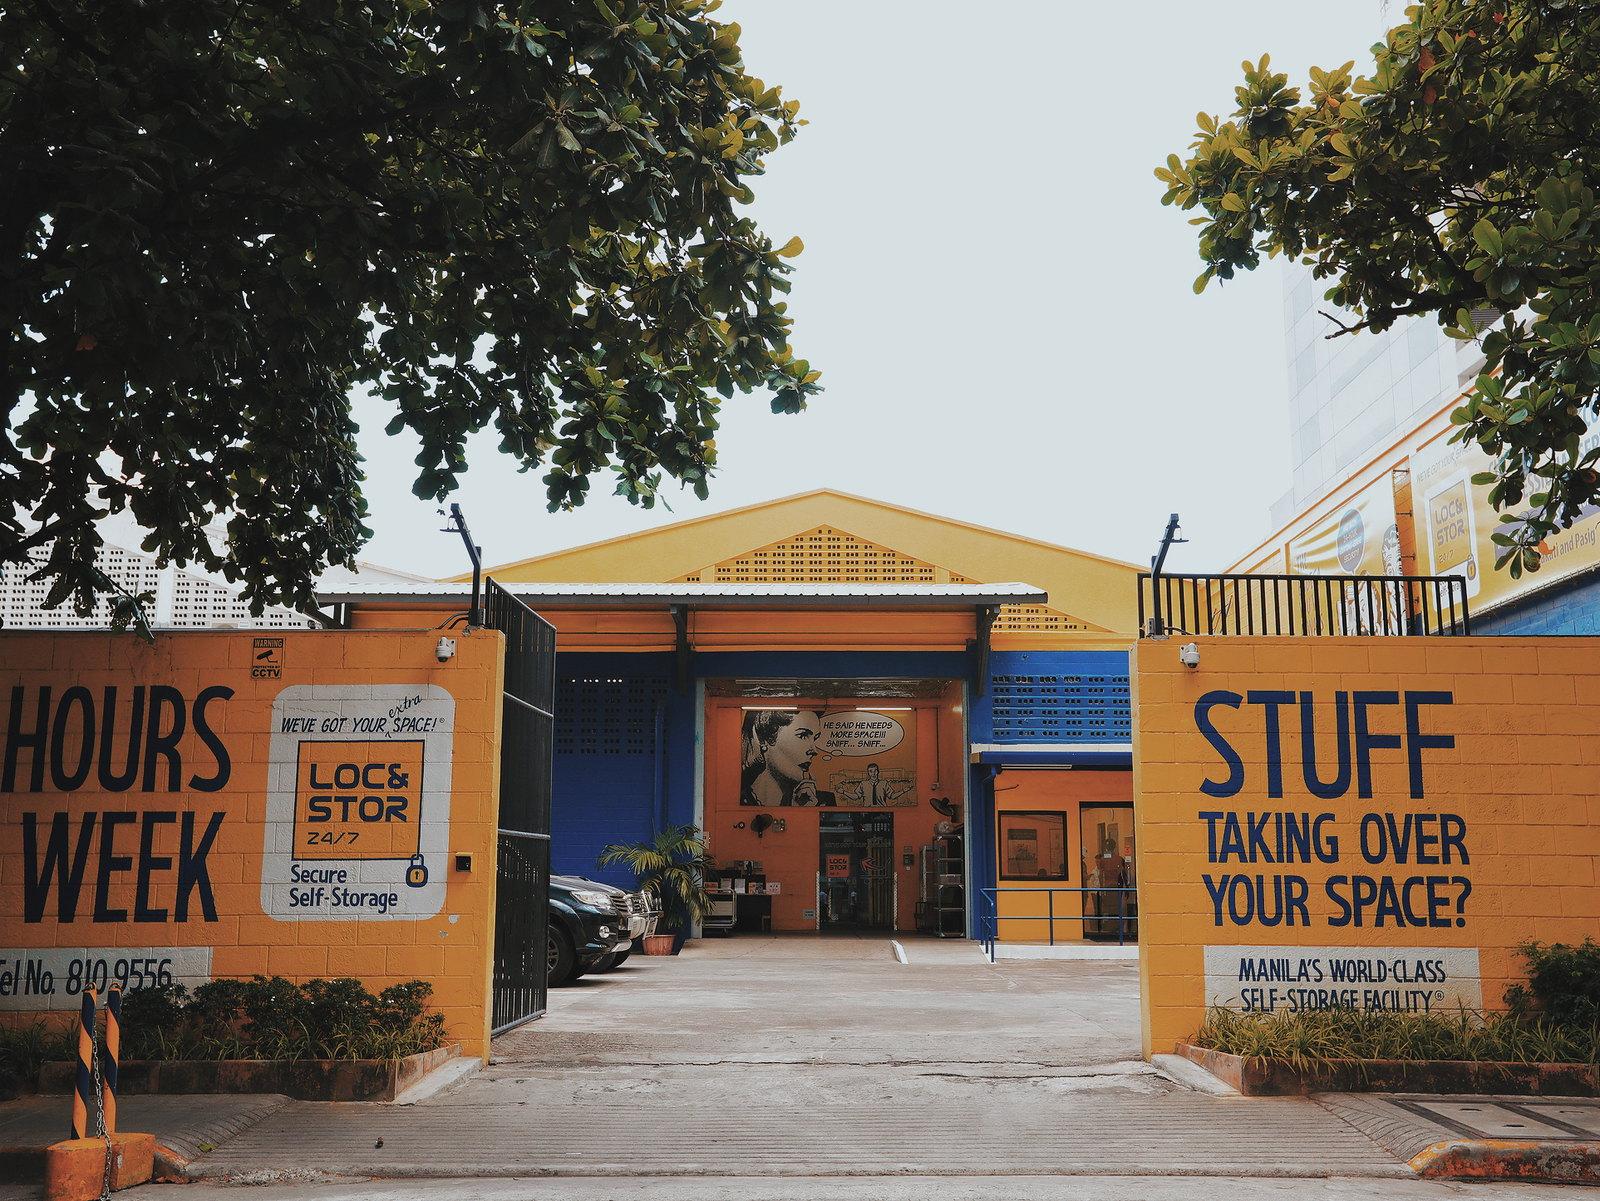 Loc&Stor 24/7: Storage Facility iin the Philippines.